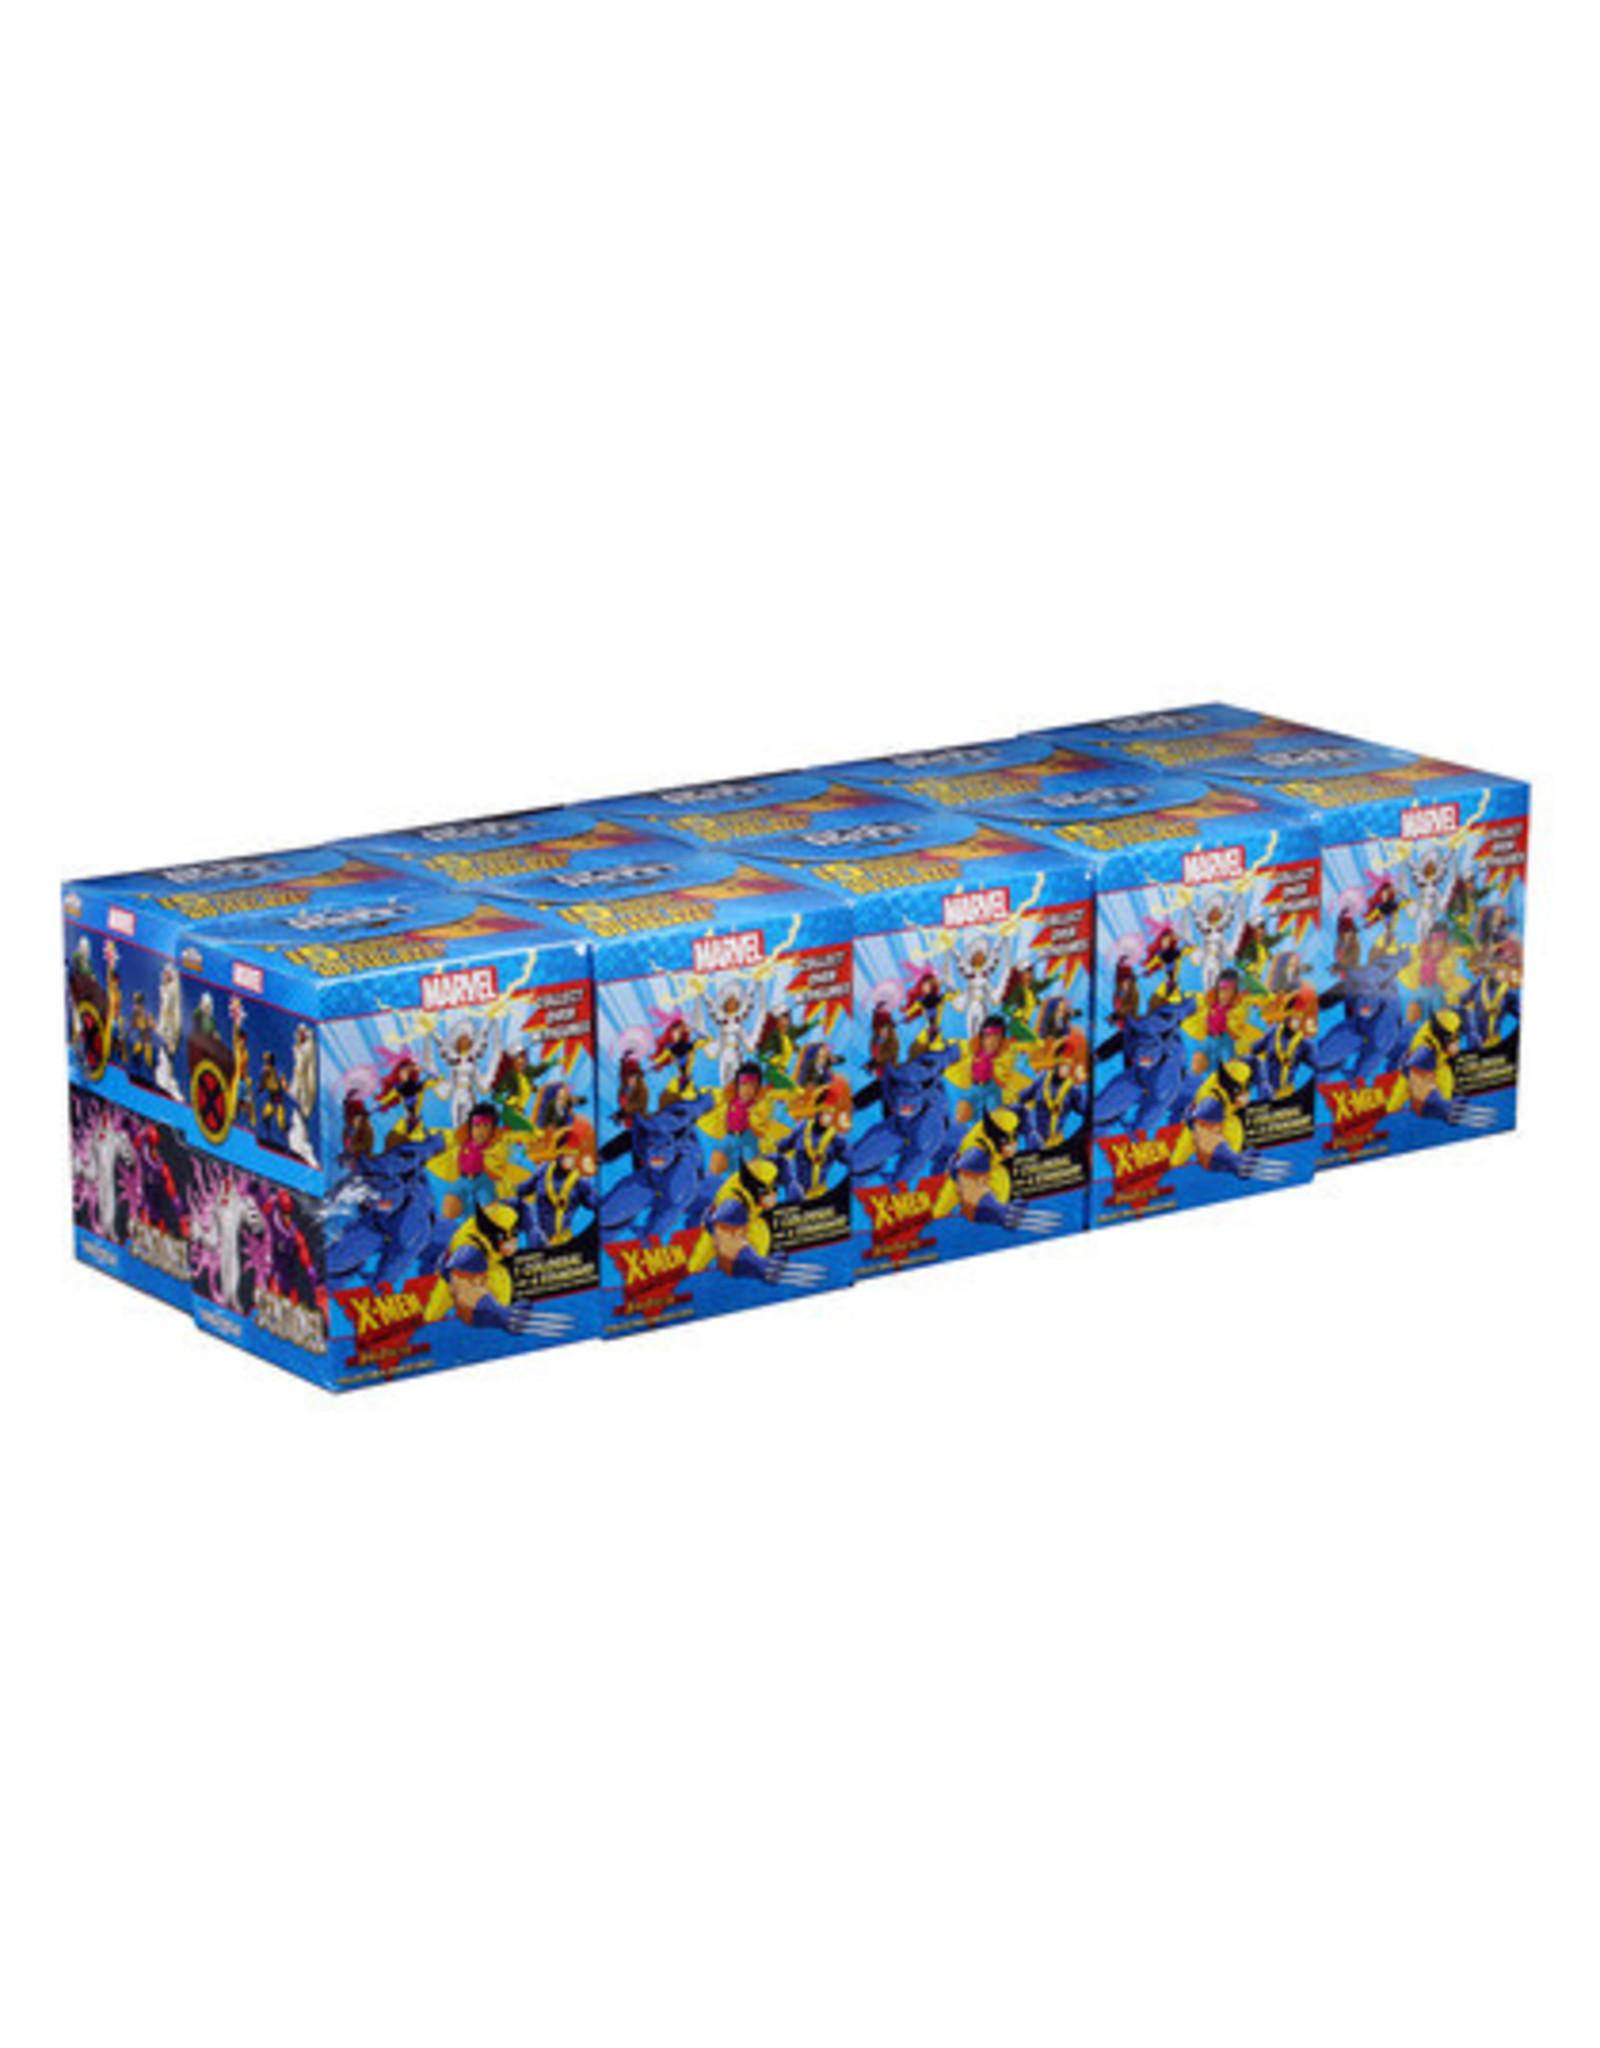 WizKids Marvel HeroClix: X-Men the Animated Series, the Dark Phoenix Saga Colossal Booster Brick